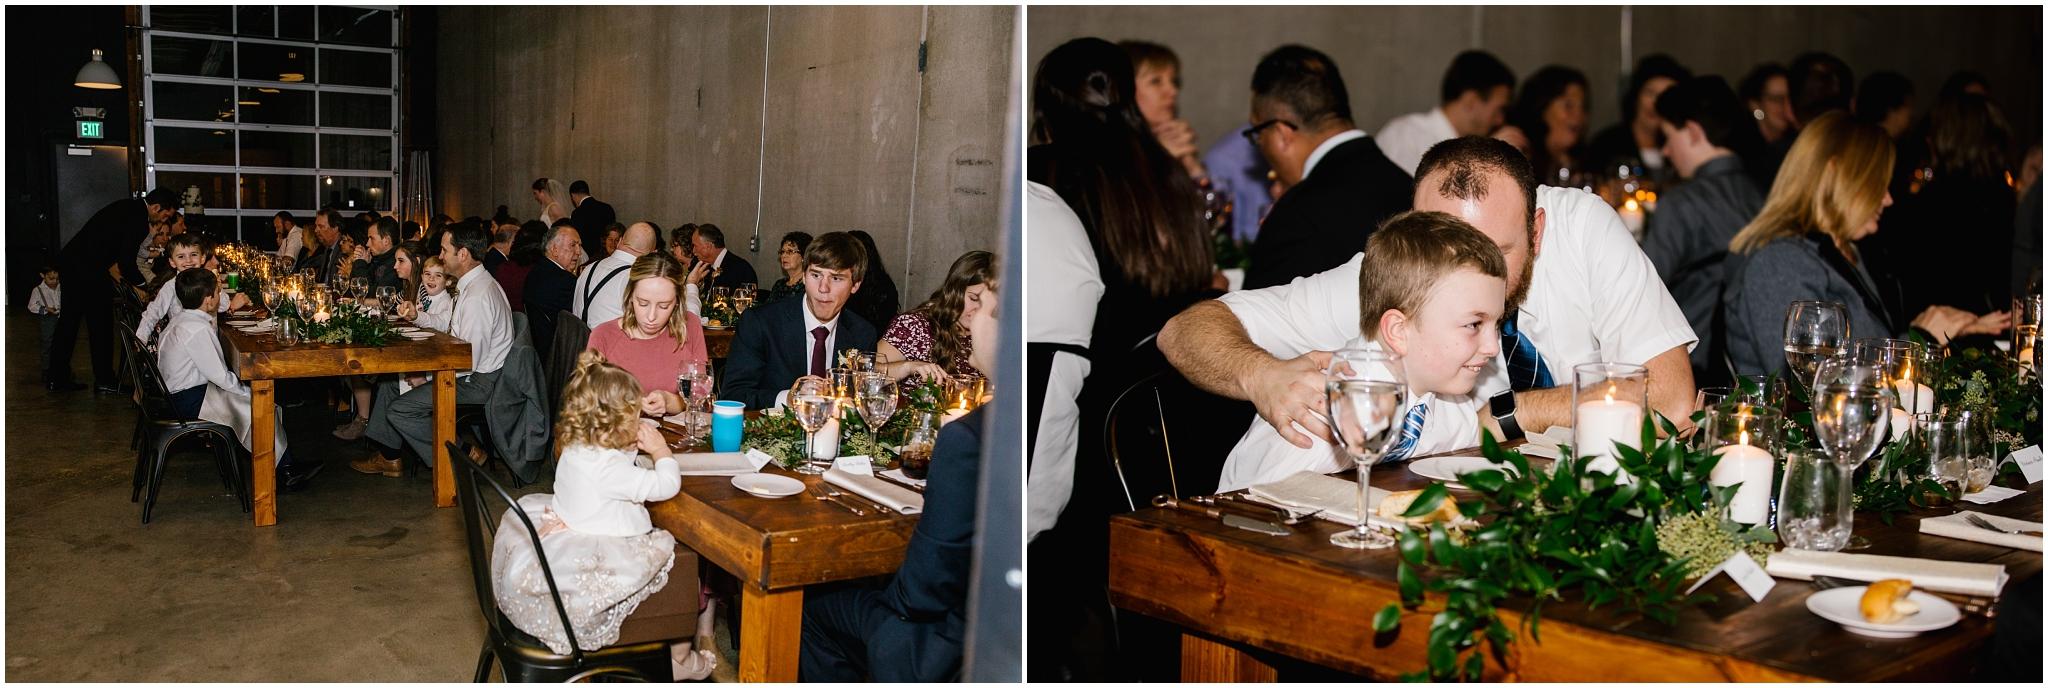 CN-Wedding-337_Lizzie-B-Imagery-Utah-Wedding-Photographer-Blessed-Sacrament-Catholic-Church-Sandy-Utah-The-Blended-Table-Salt-Lake-City.jpg